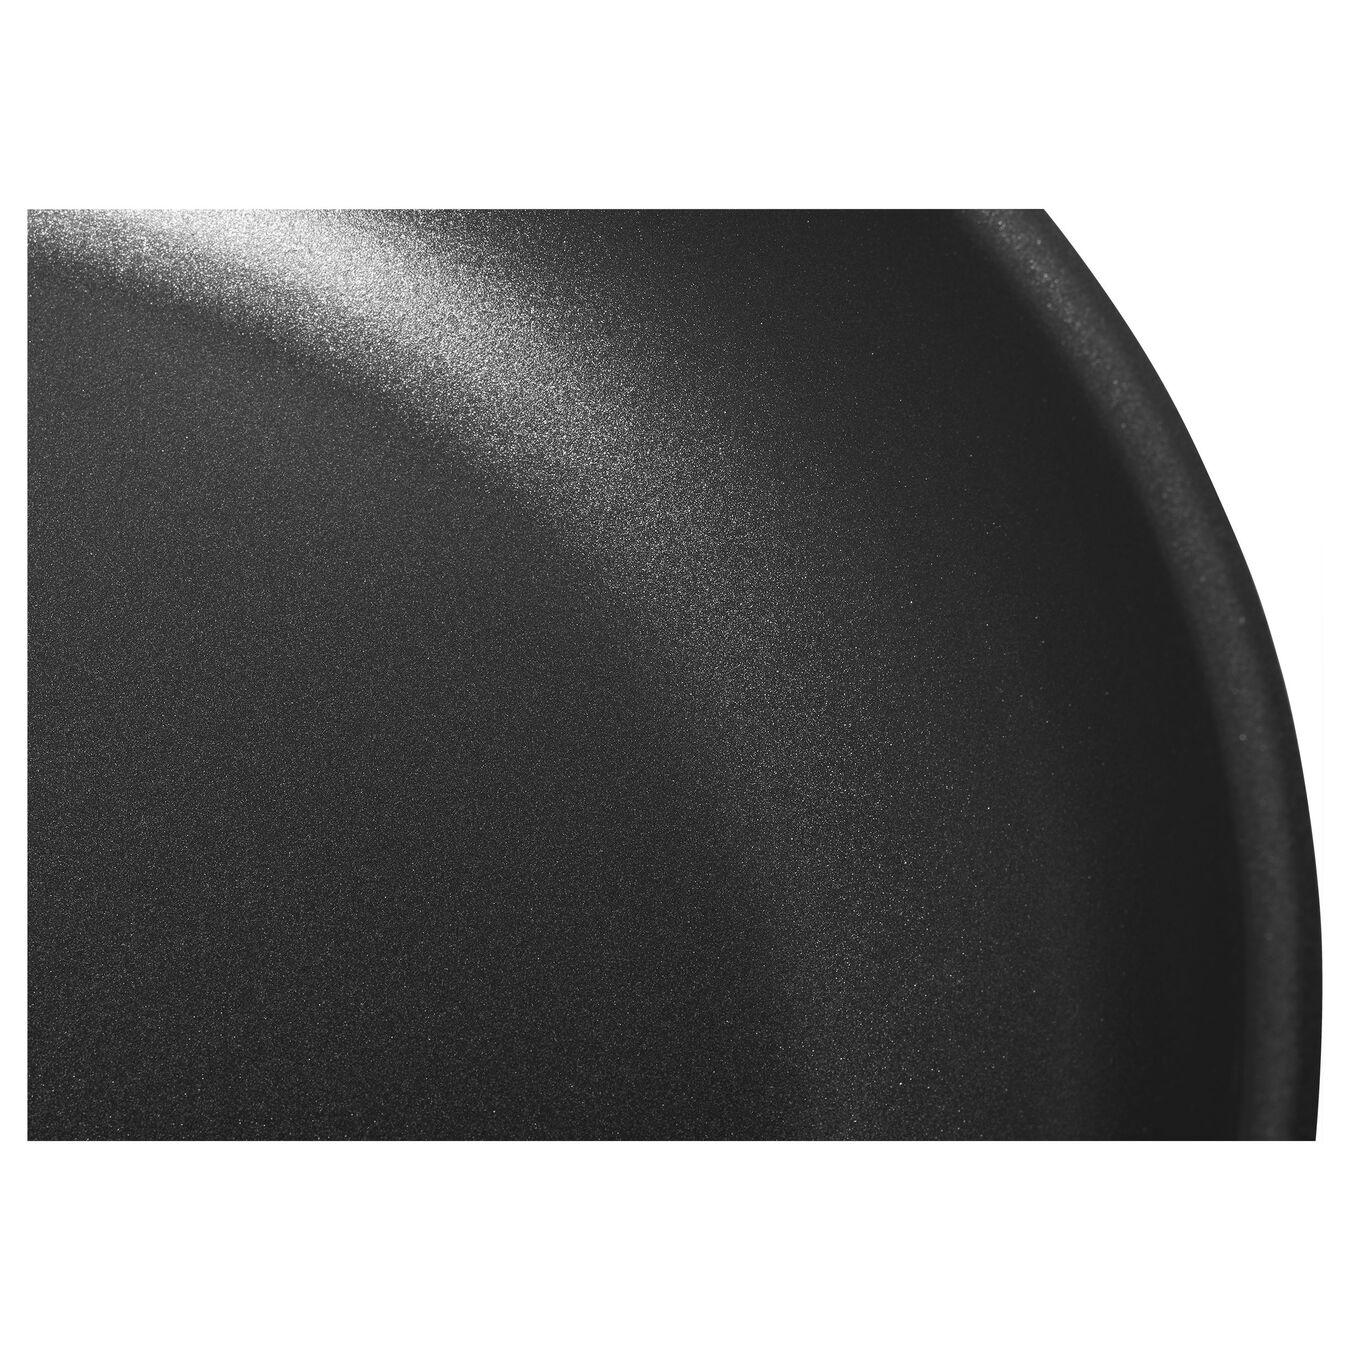 Set di padelle - 3-pz., acciaio inox,,large 6